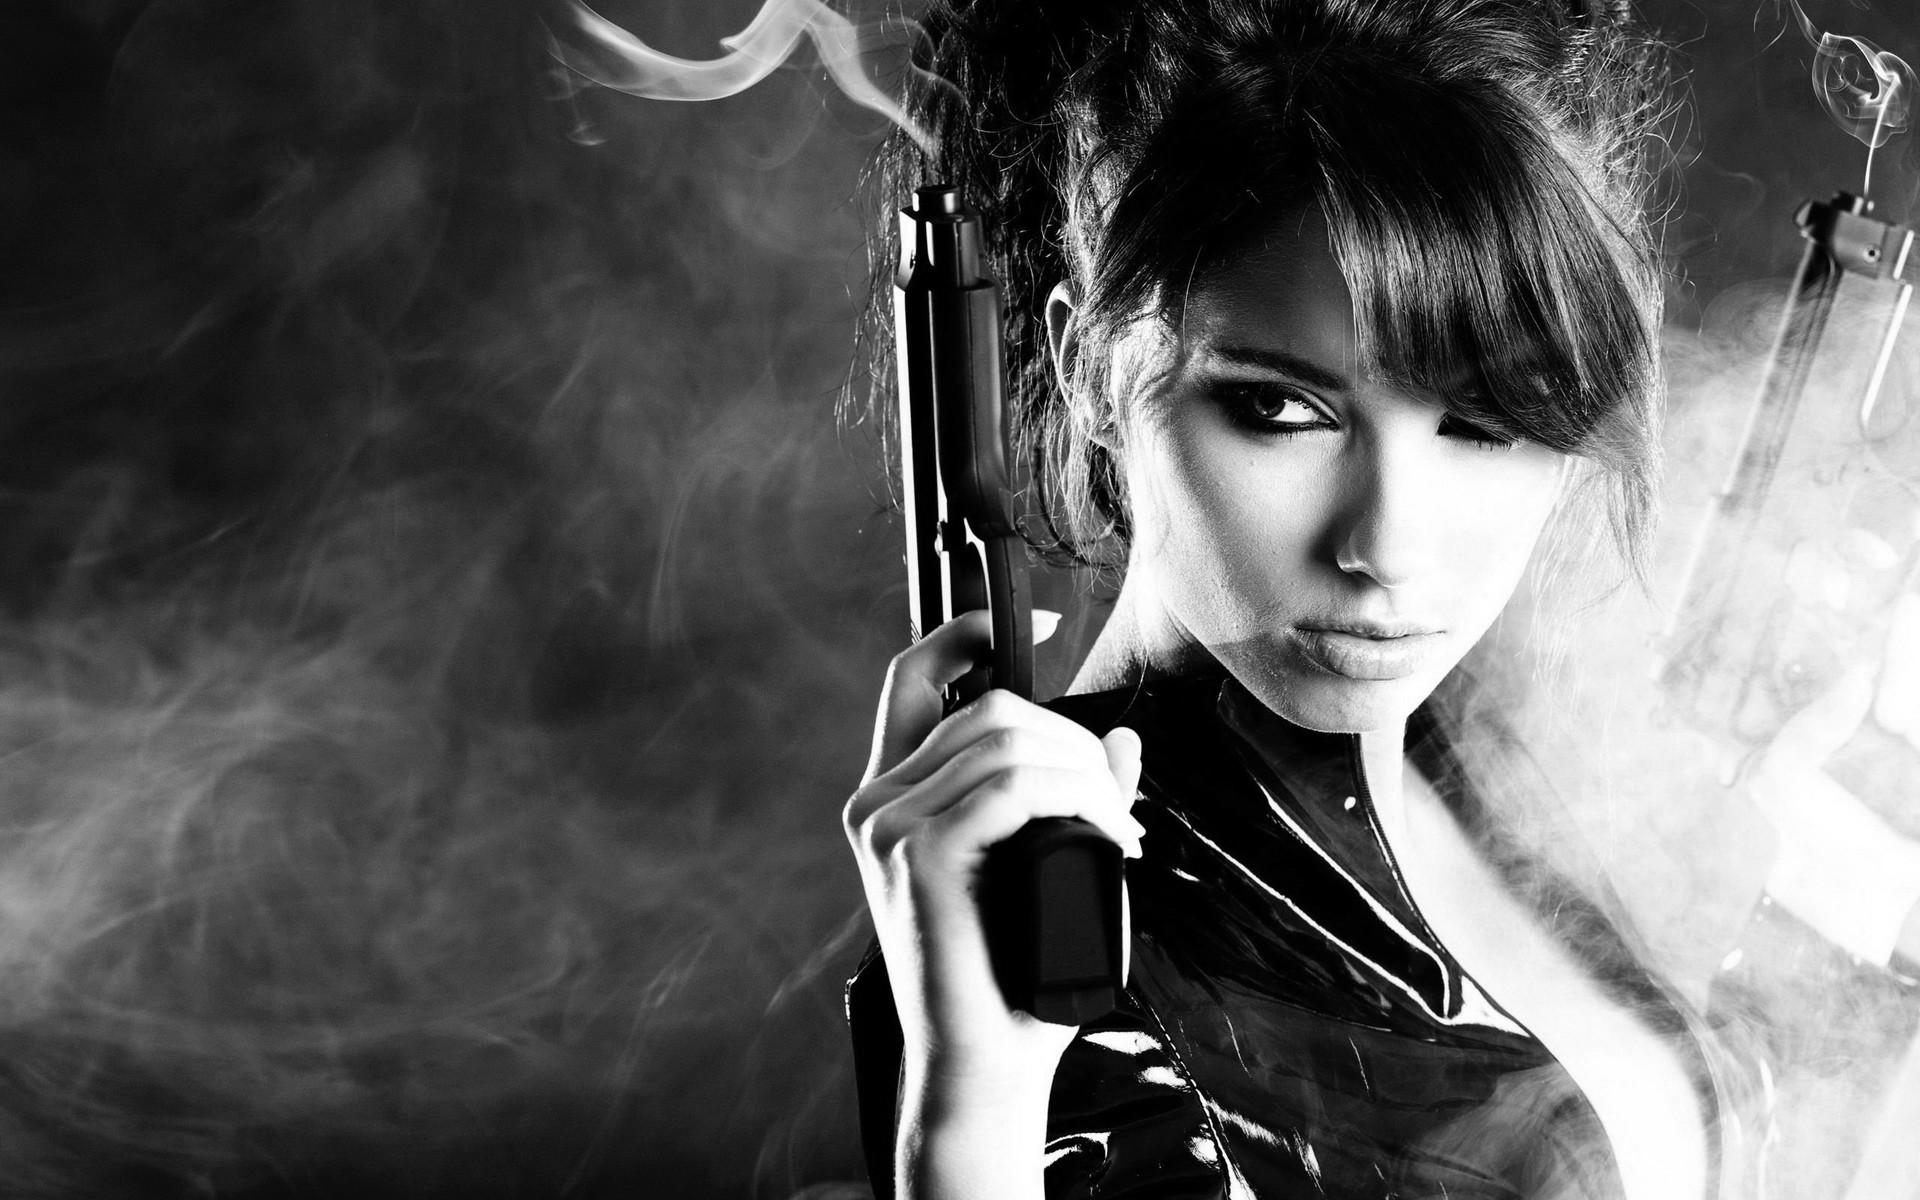 gun brunette military guns gun girl girls pistol smoke b-w wallpaper